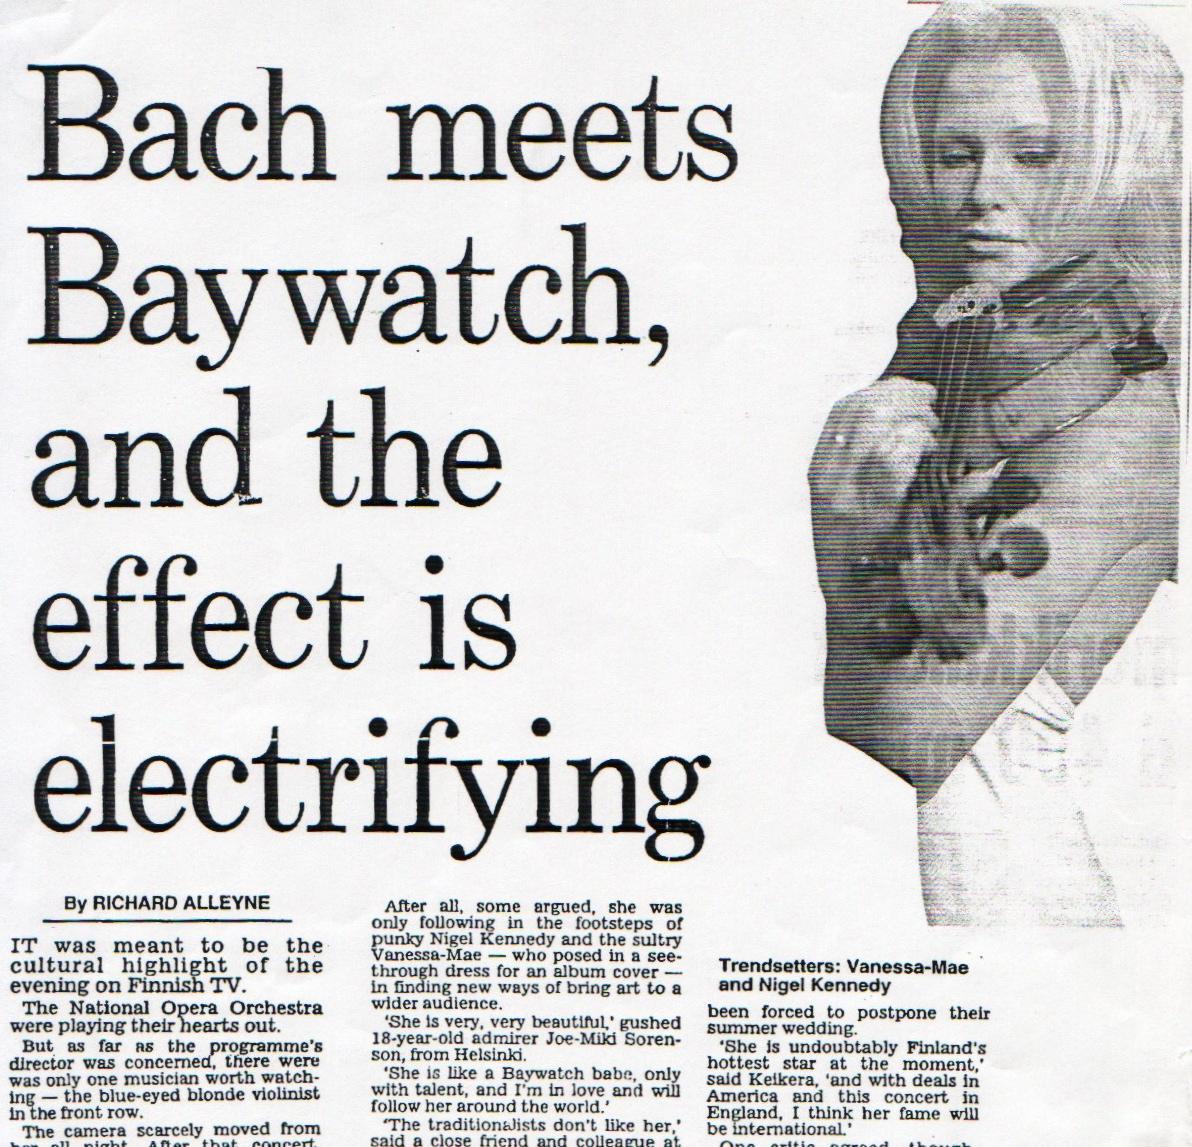 bach meets baywatch